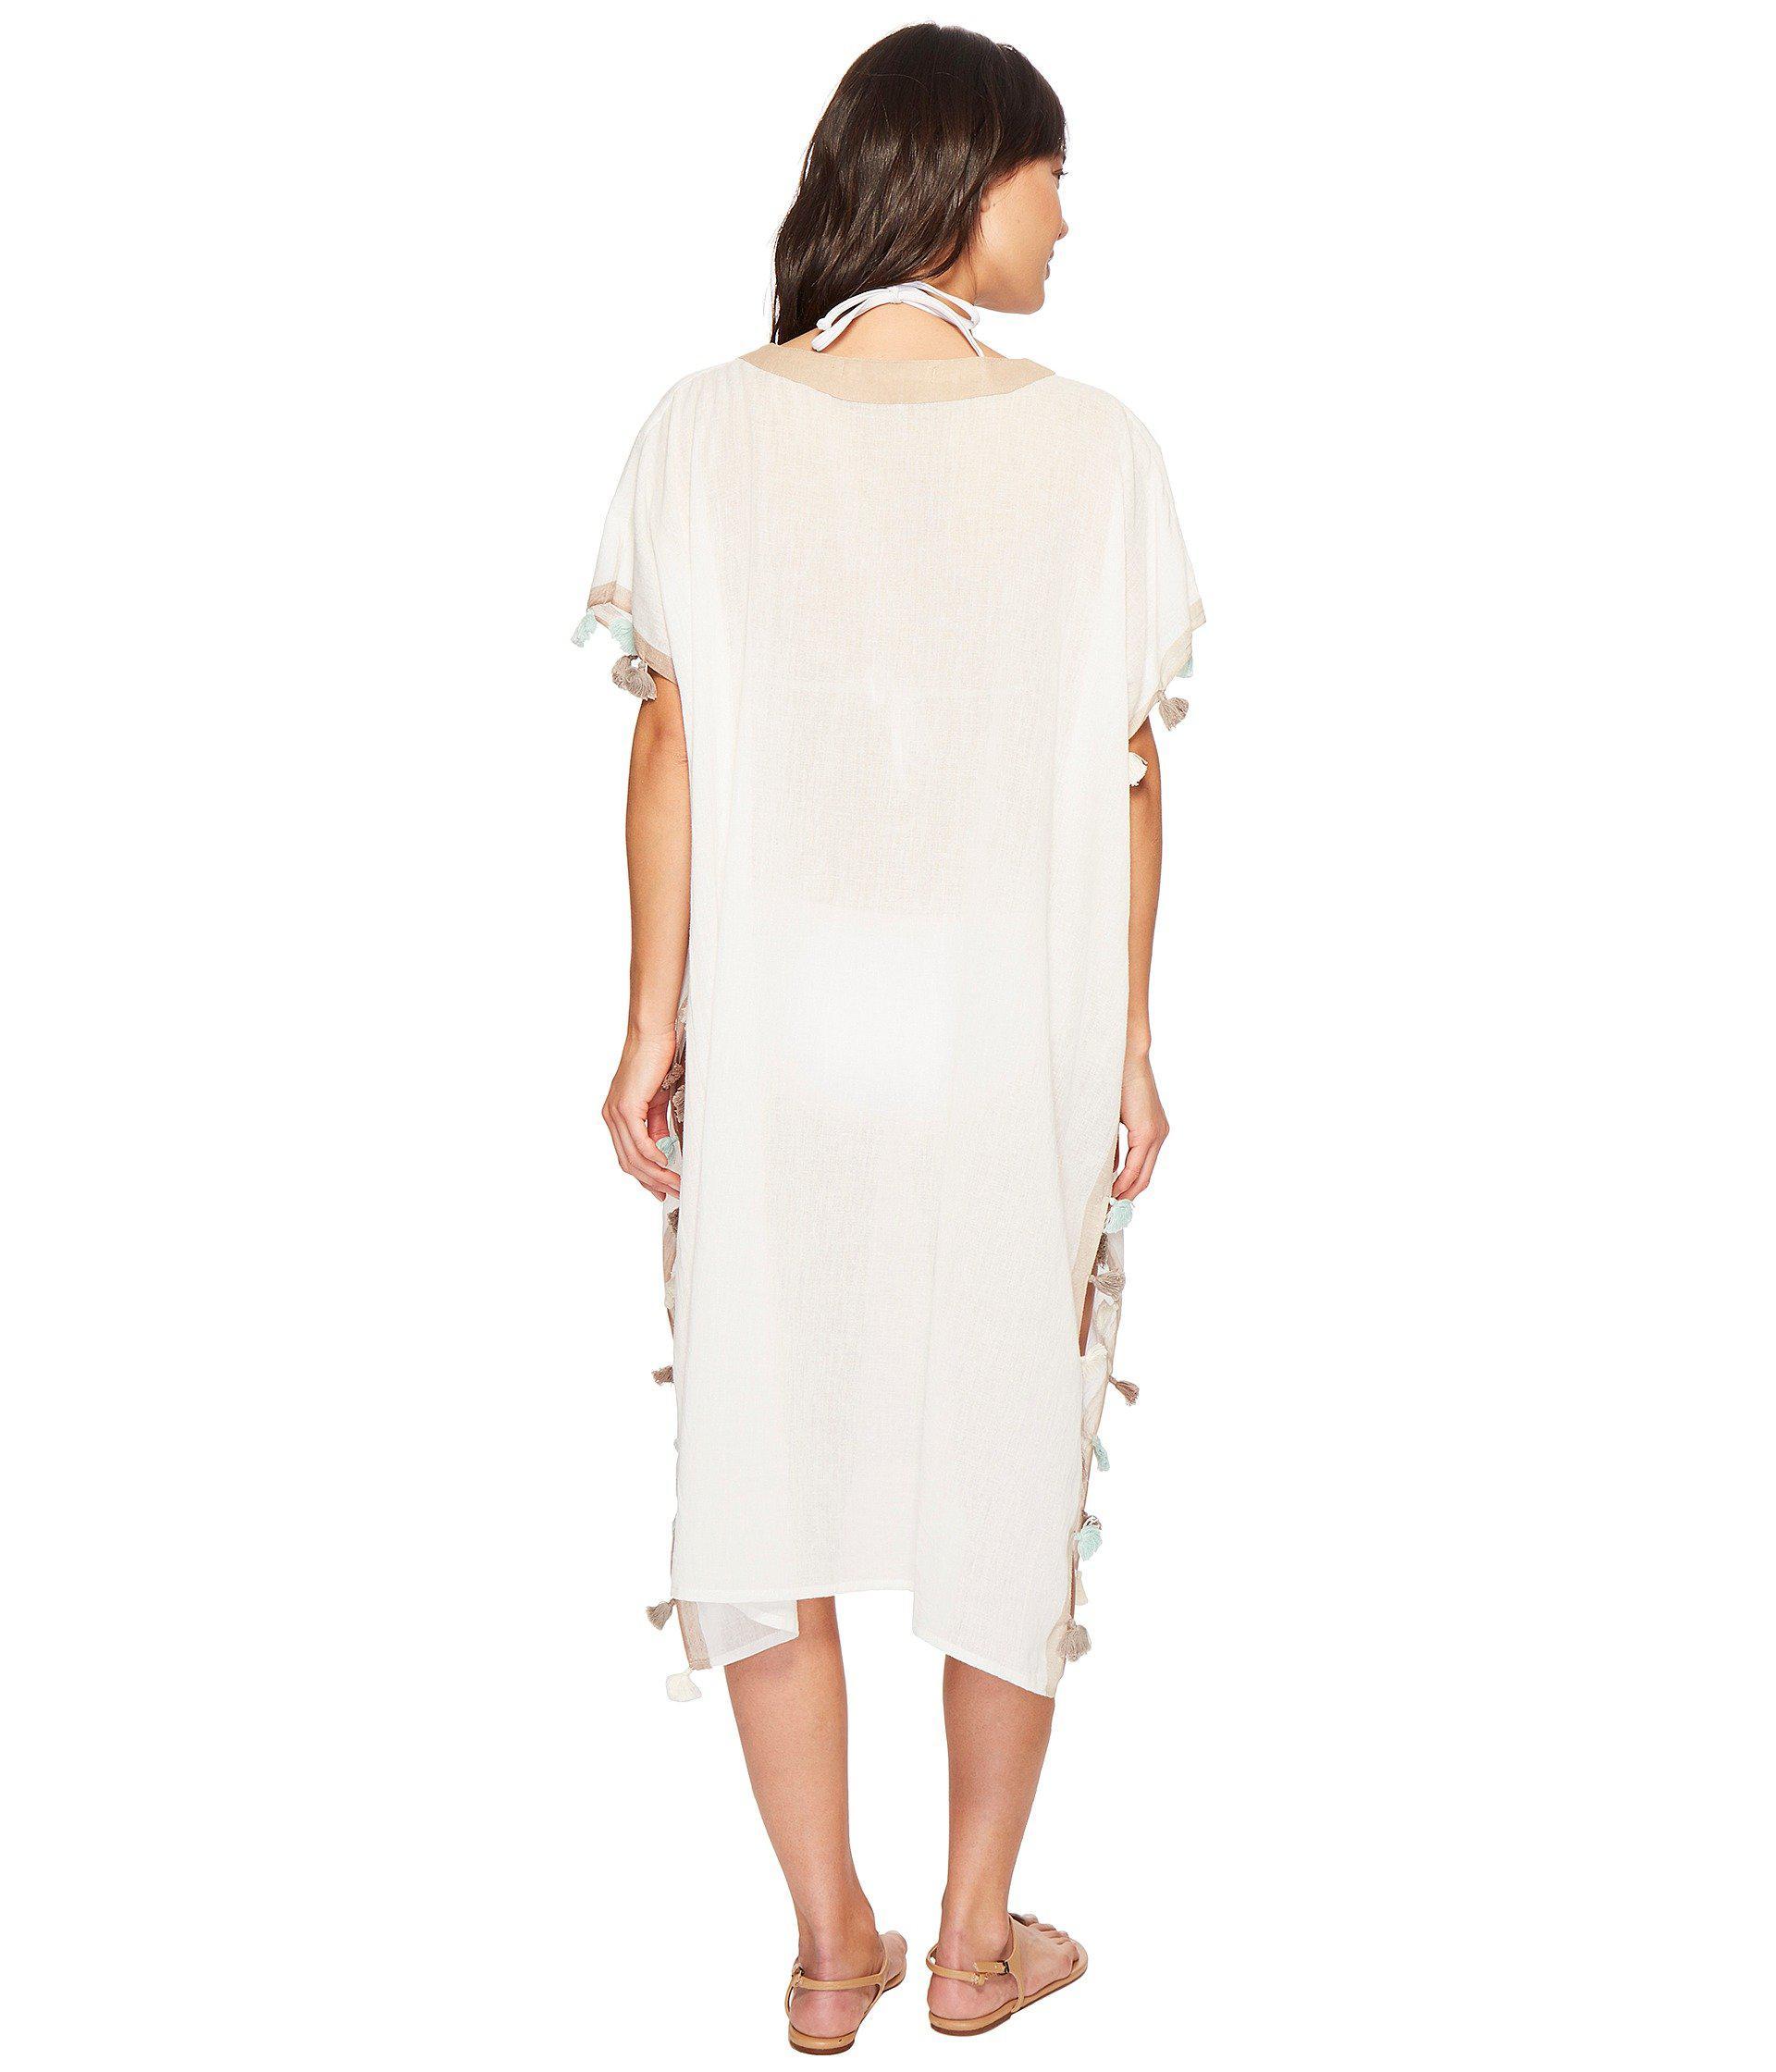 0de880ffa884 Lyst - Michael Stars Cebu Maxi Kaftan (chalk) Women's Clothing in White